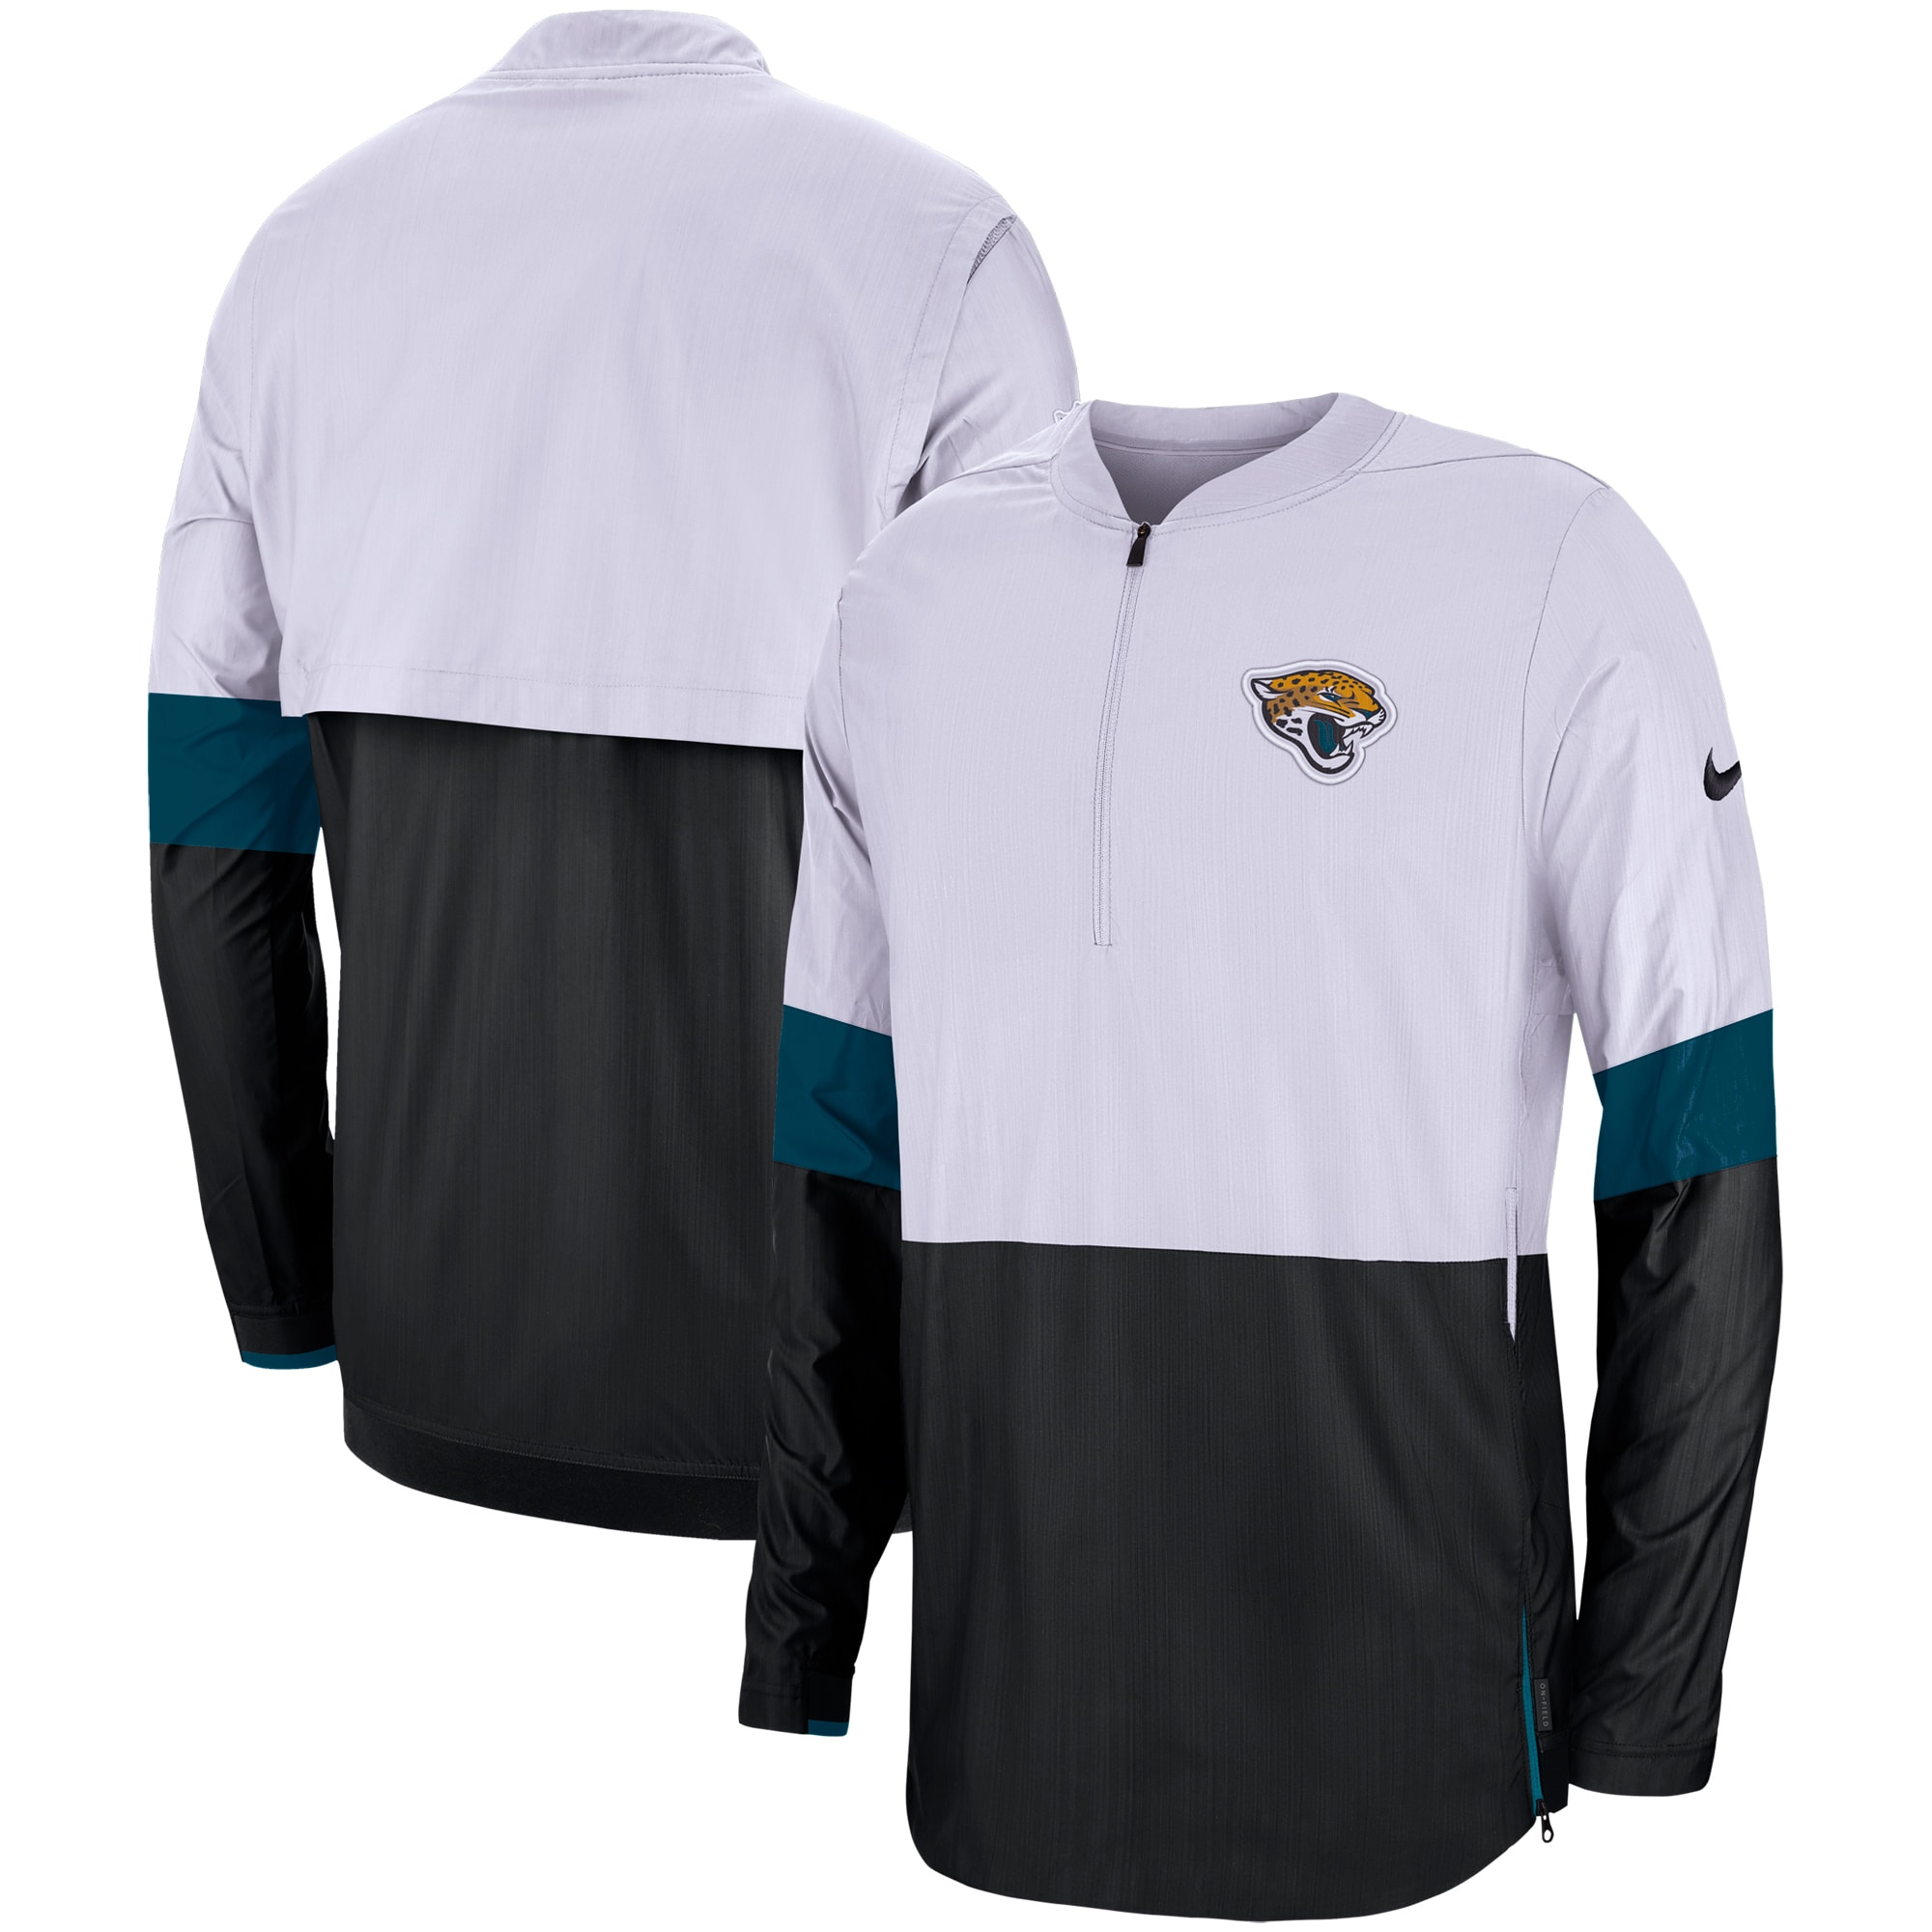 Jacksonville Jaguars Nike Sideline Coaches Half-Zip Pullover Jacket - White/Black